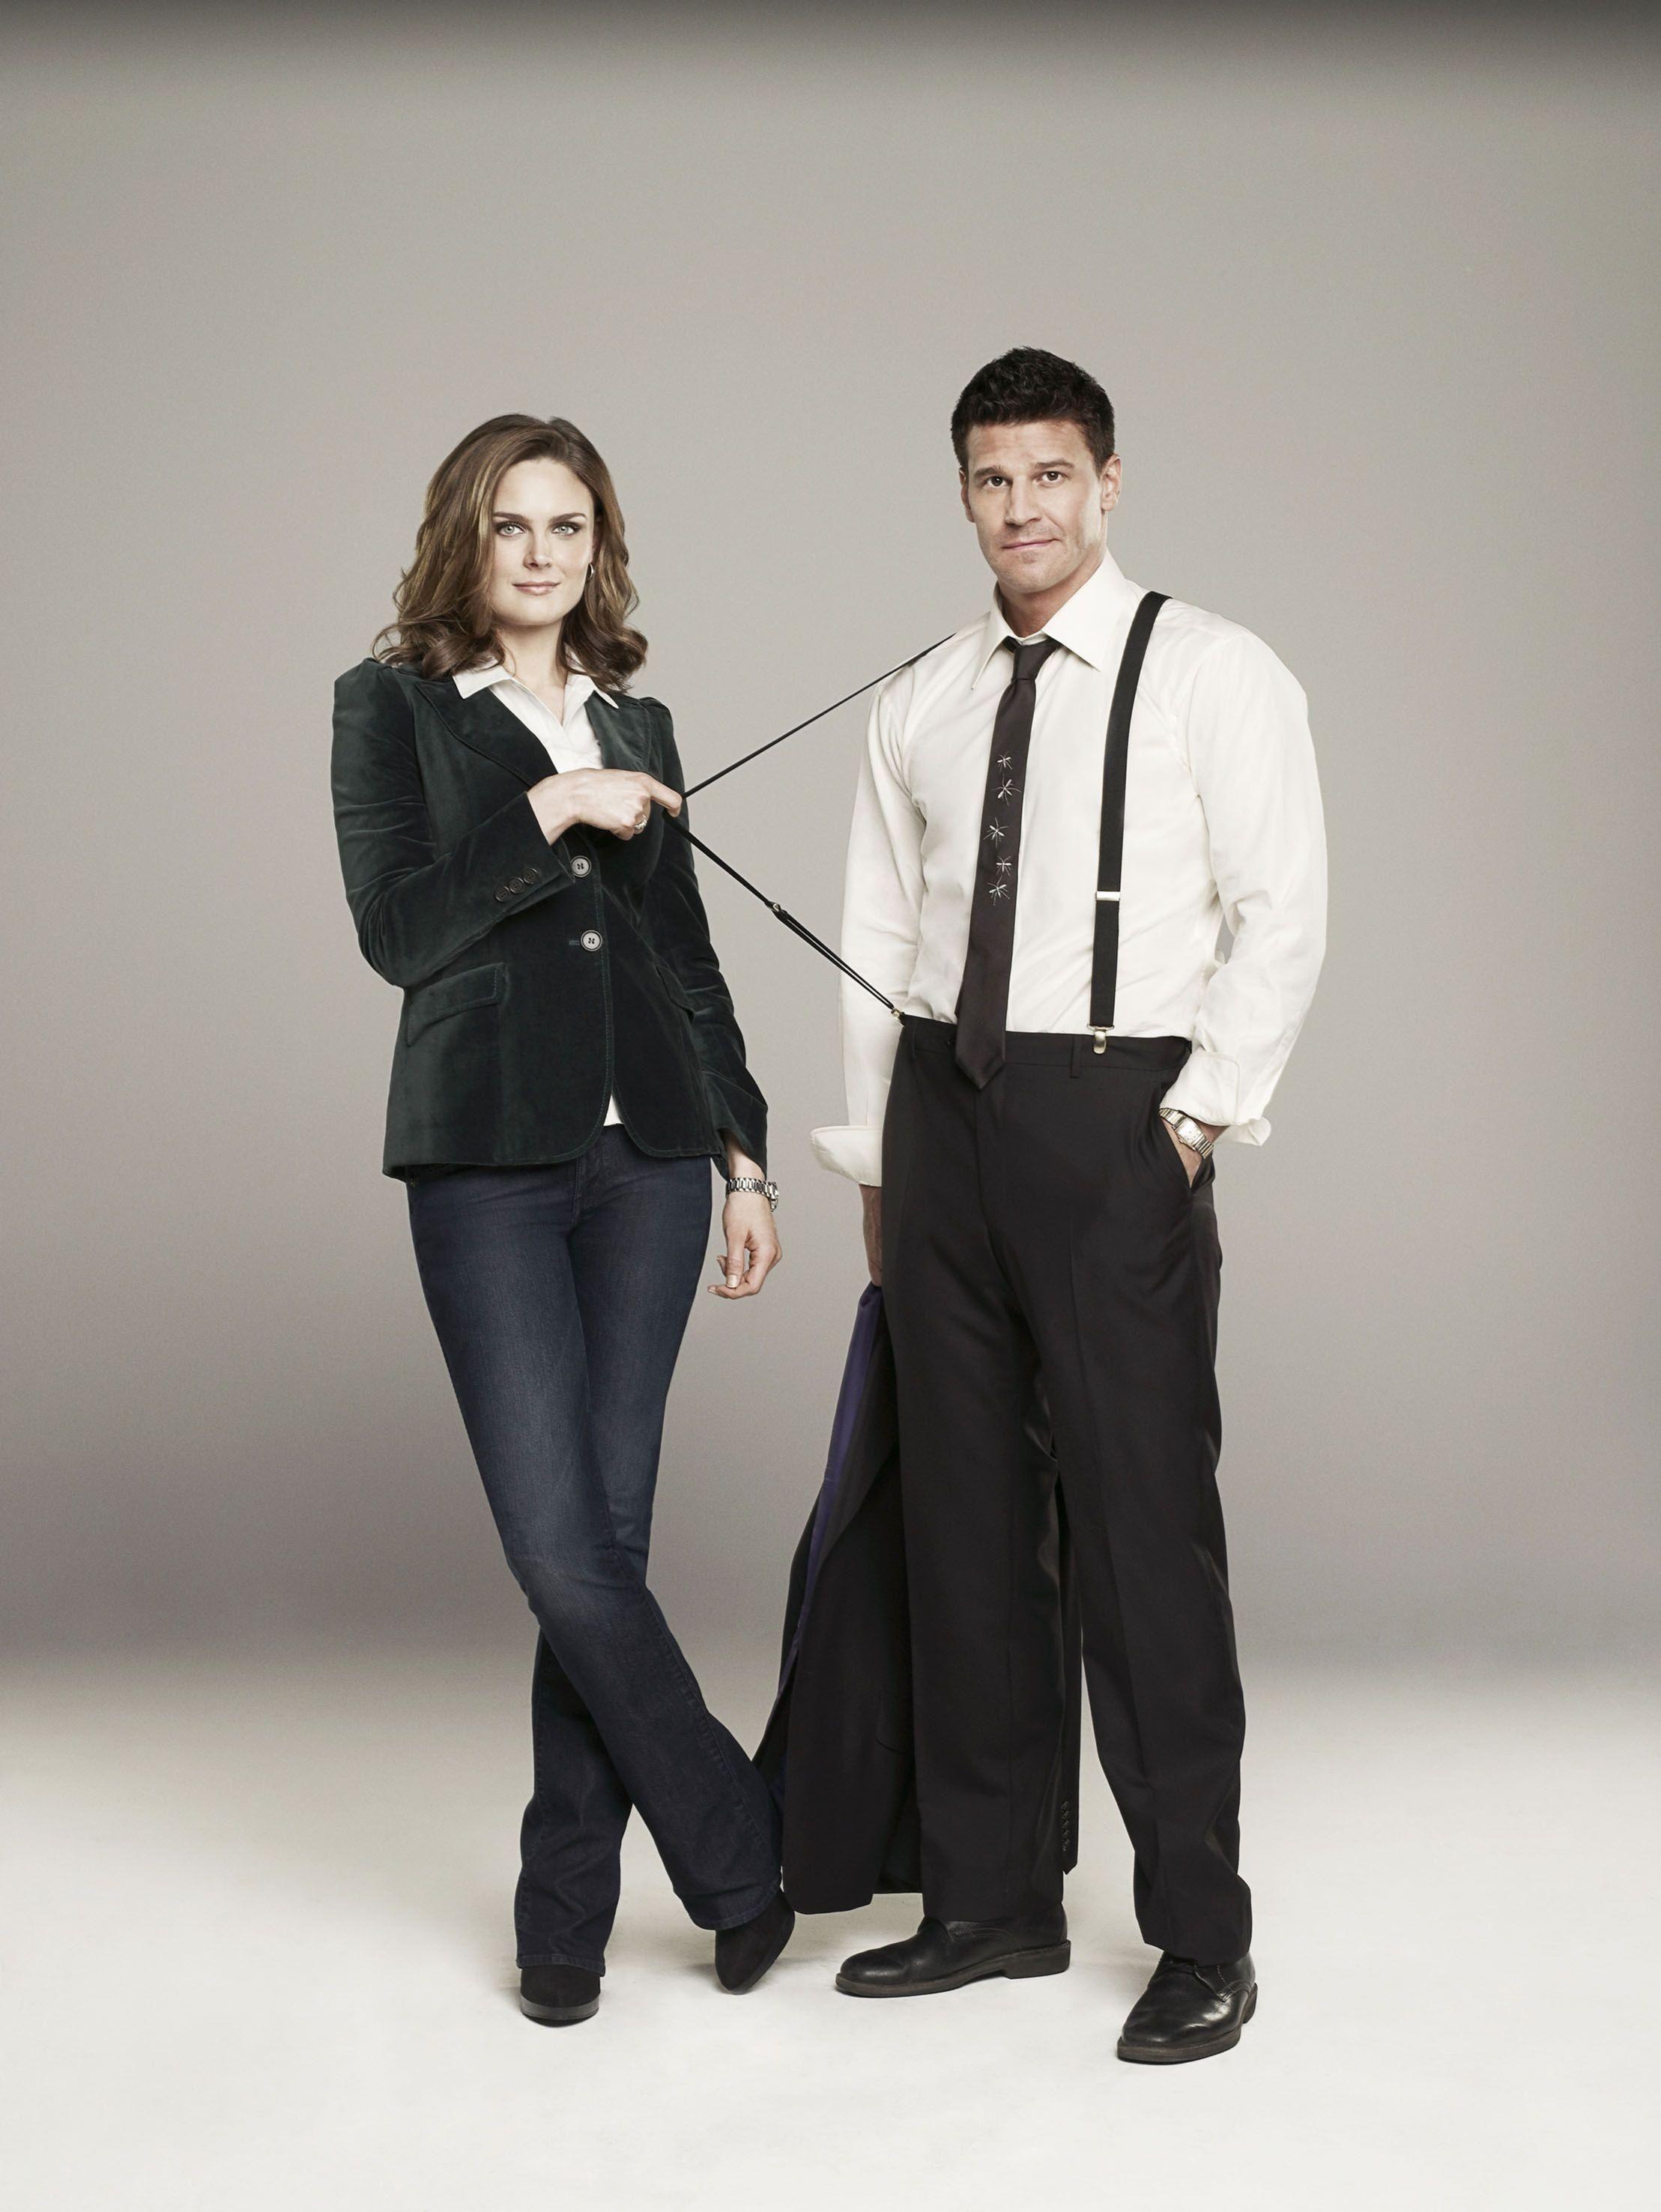 Bones - Season 5 Promo | Bones | Booth, bones, Bones series, Bones